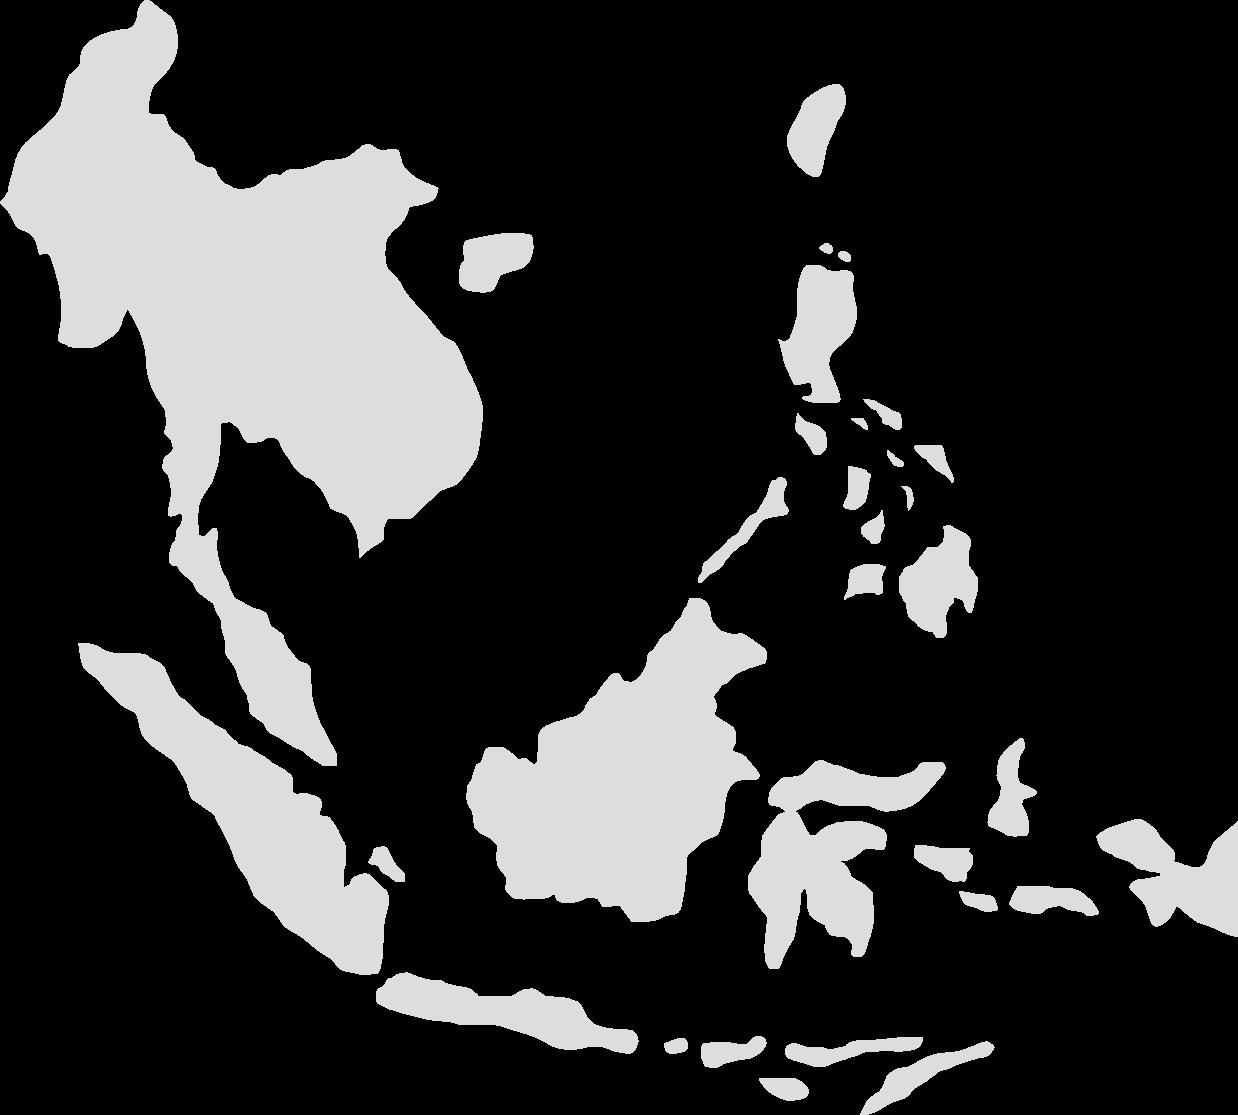 maps-01 Starmicronics